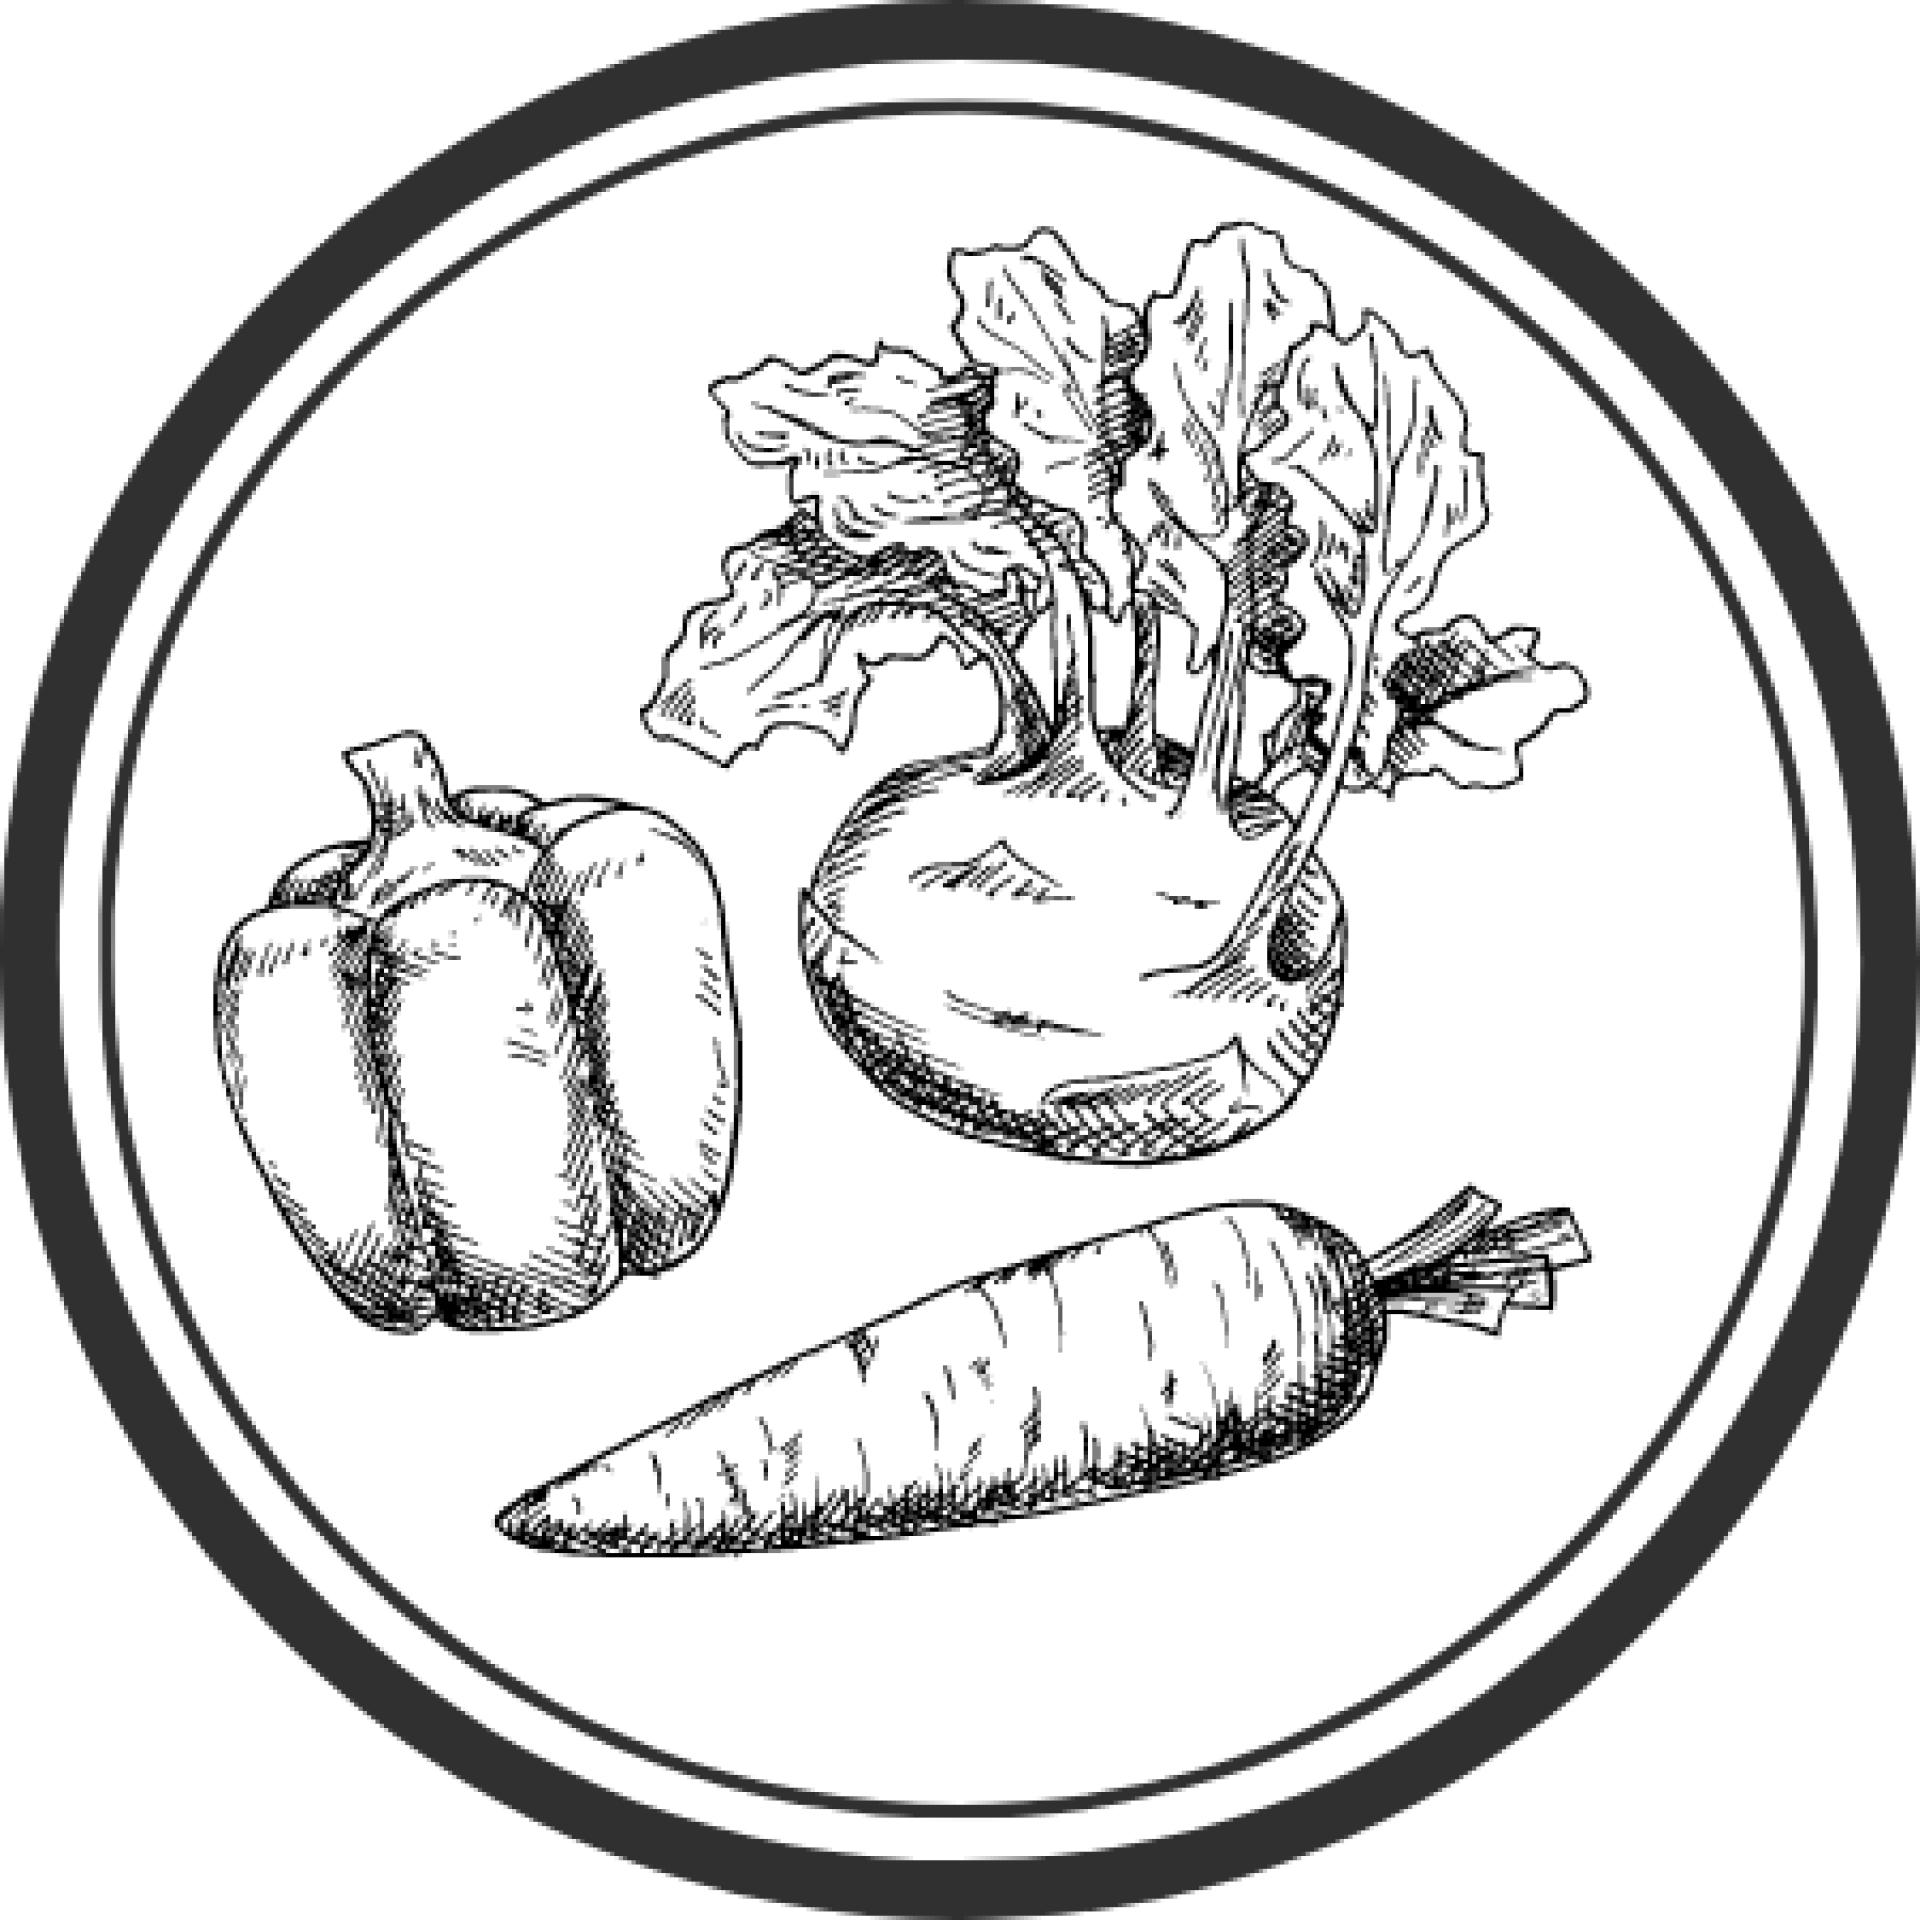 100% Plant-Based